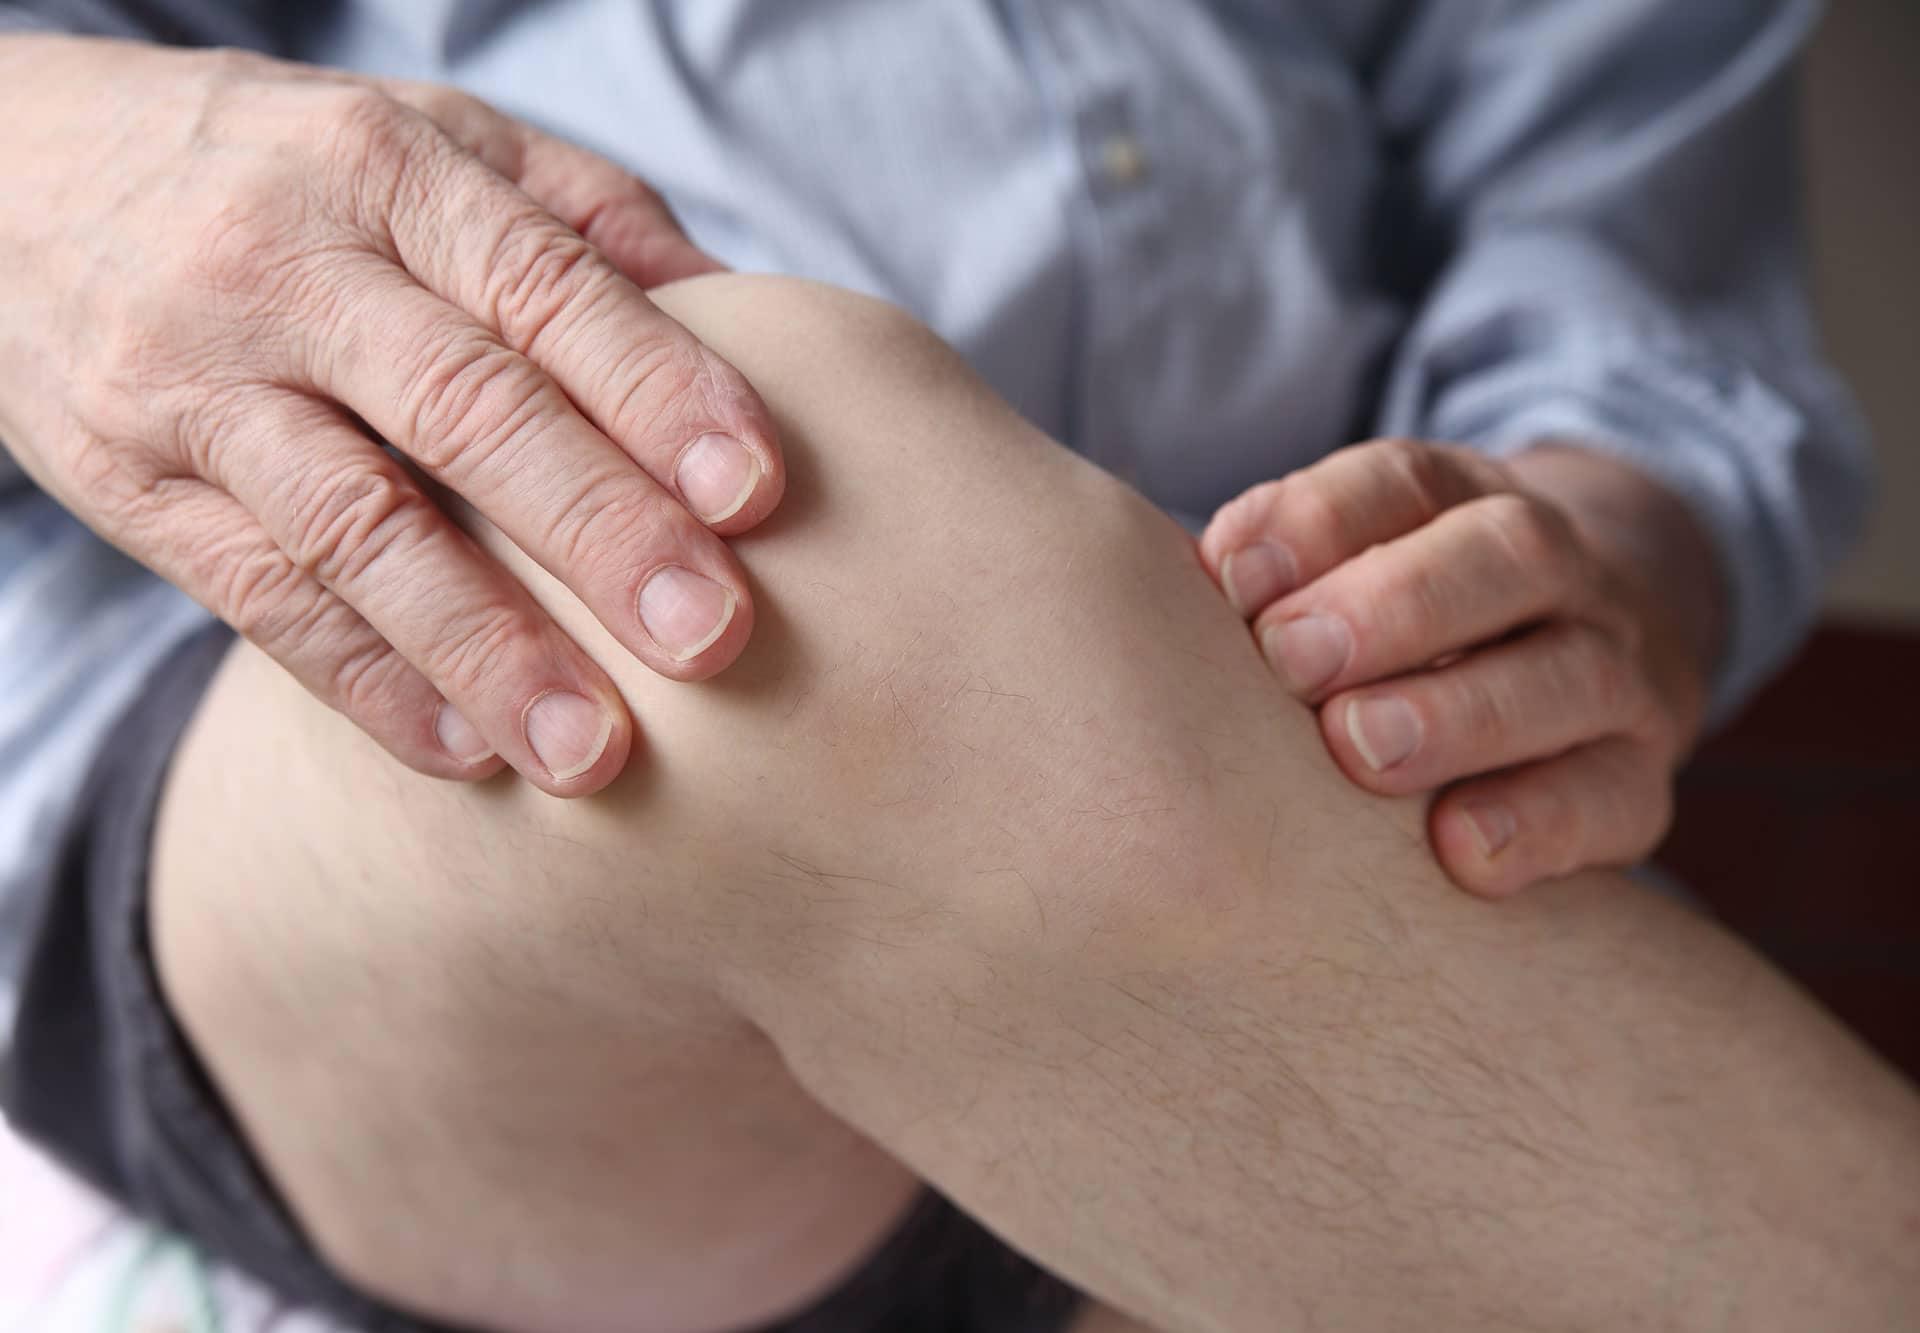 Mensch fühlt Knie - Kniearthrose?